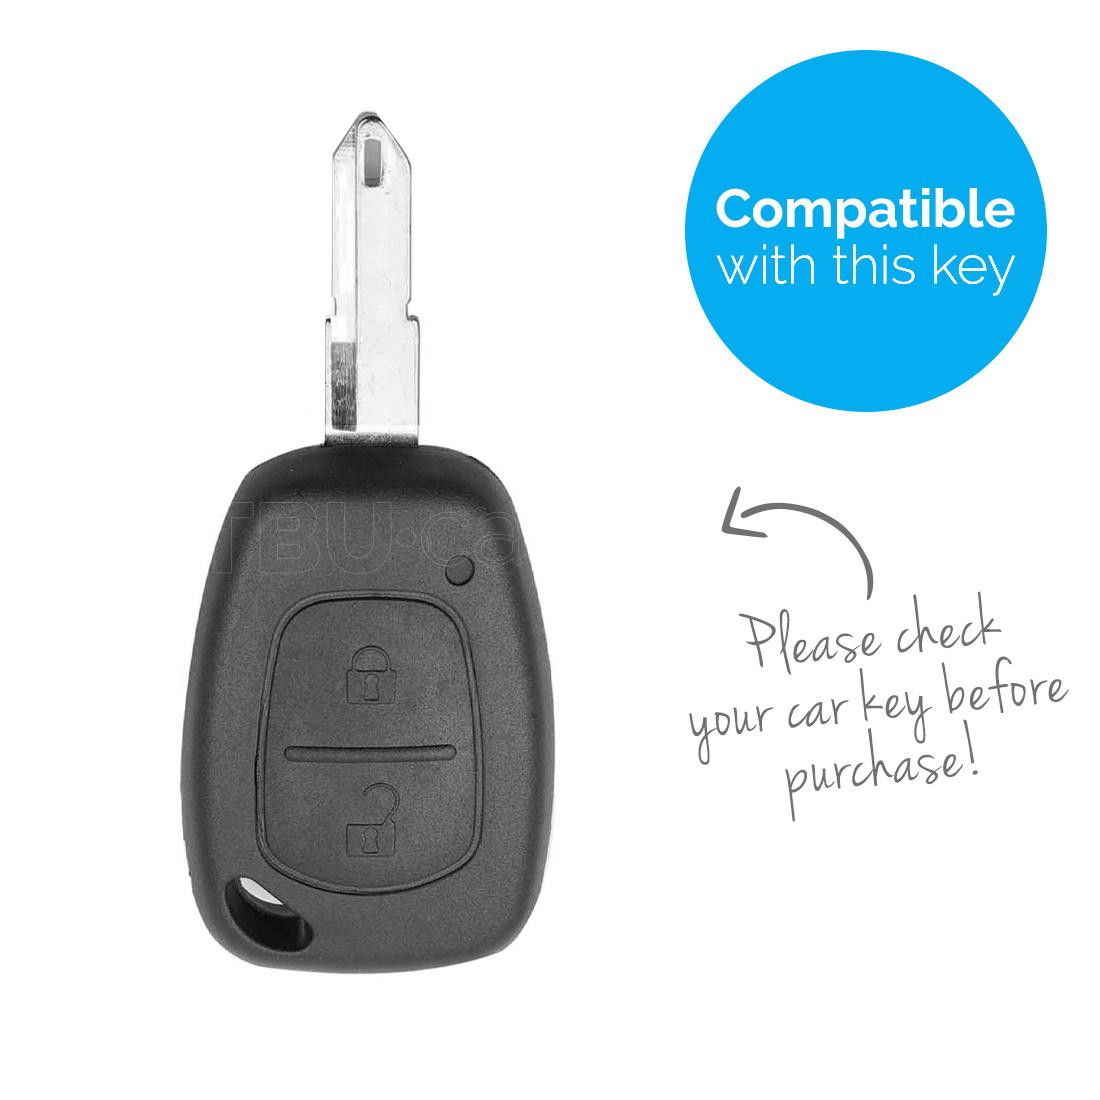 TBU car TBU car Sleutel cover compatibel met Vauxhall - Silicone sleutelhoesje - beschermhoesje autosleutel - Roze